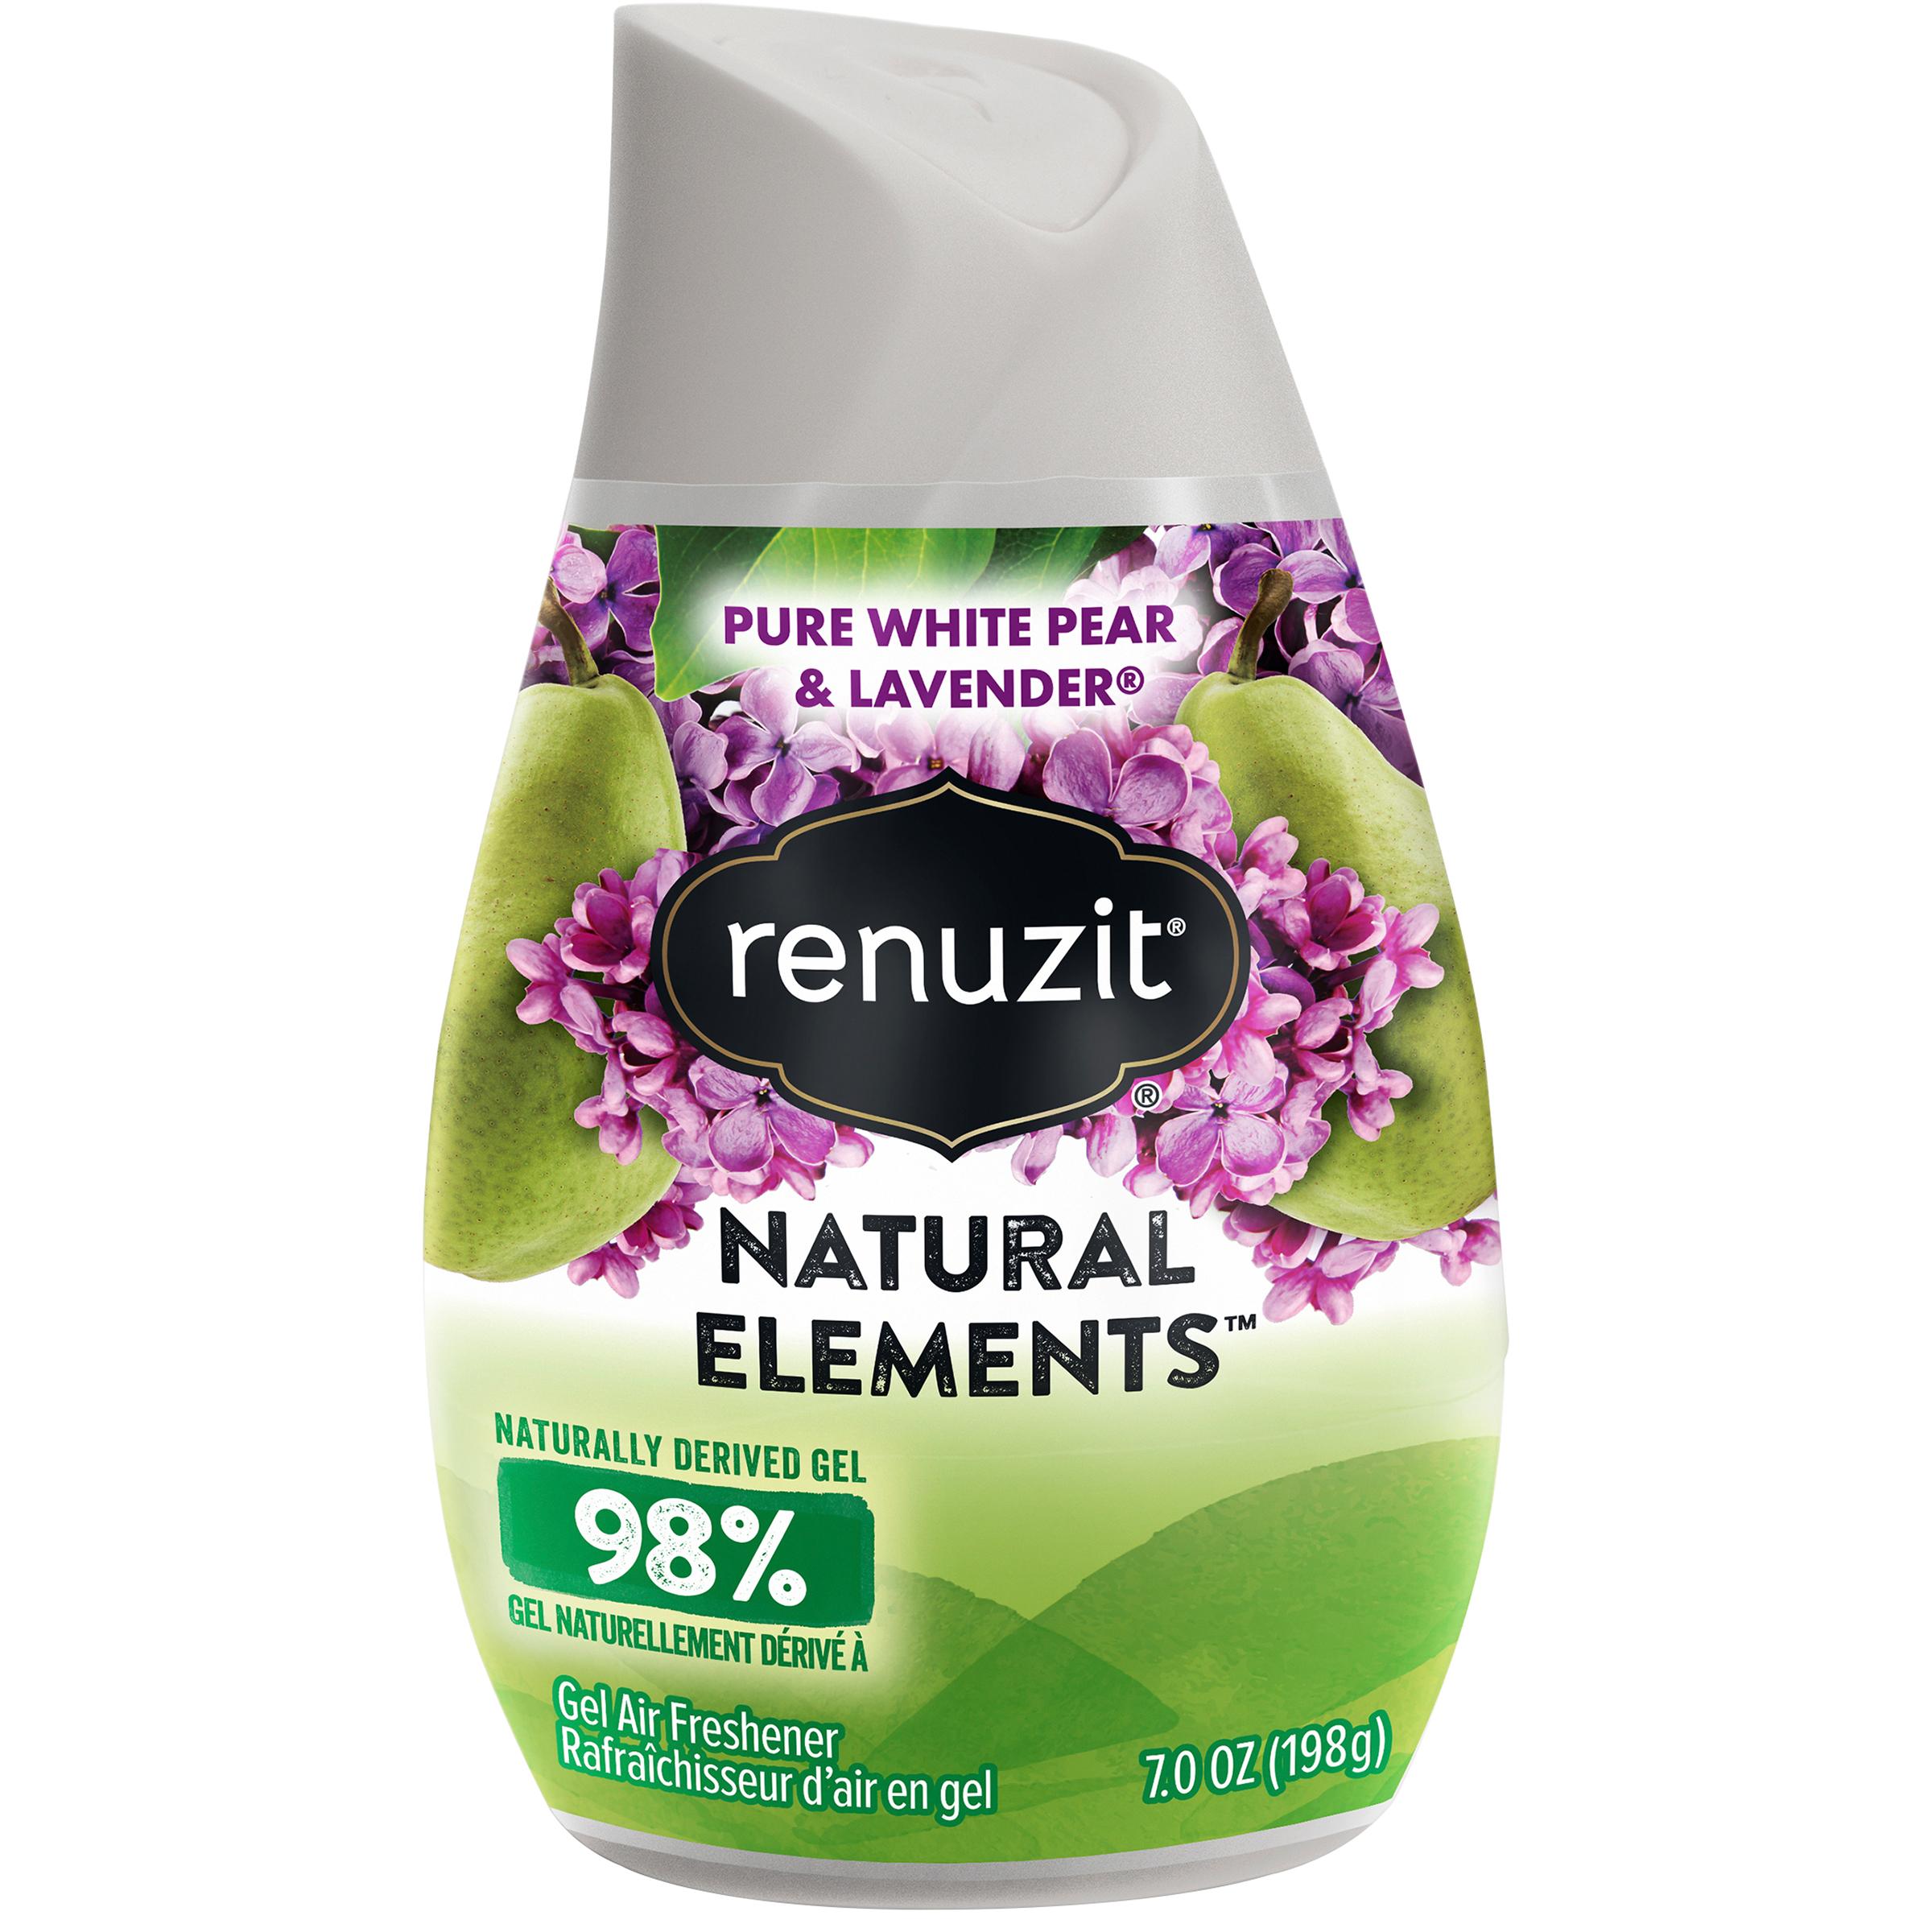 (4 pack) Renuzit Natural Elements Gel Air Freshener, Pure White Pear & Lavender, 7 Ounces